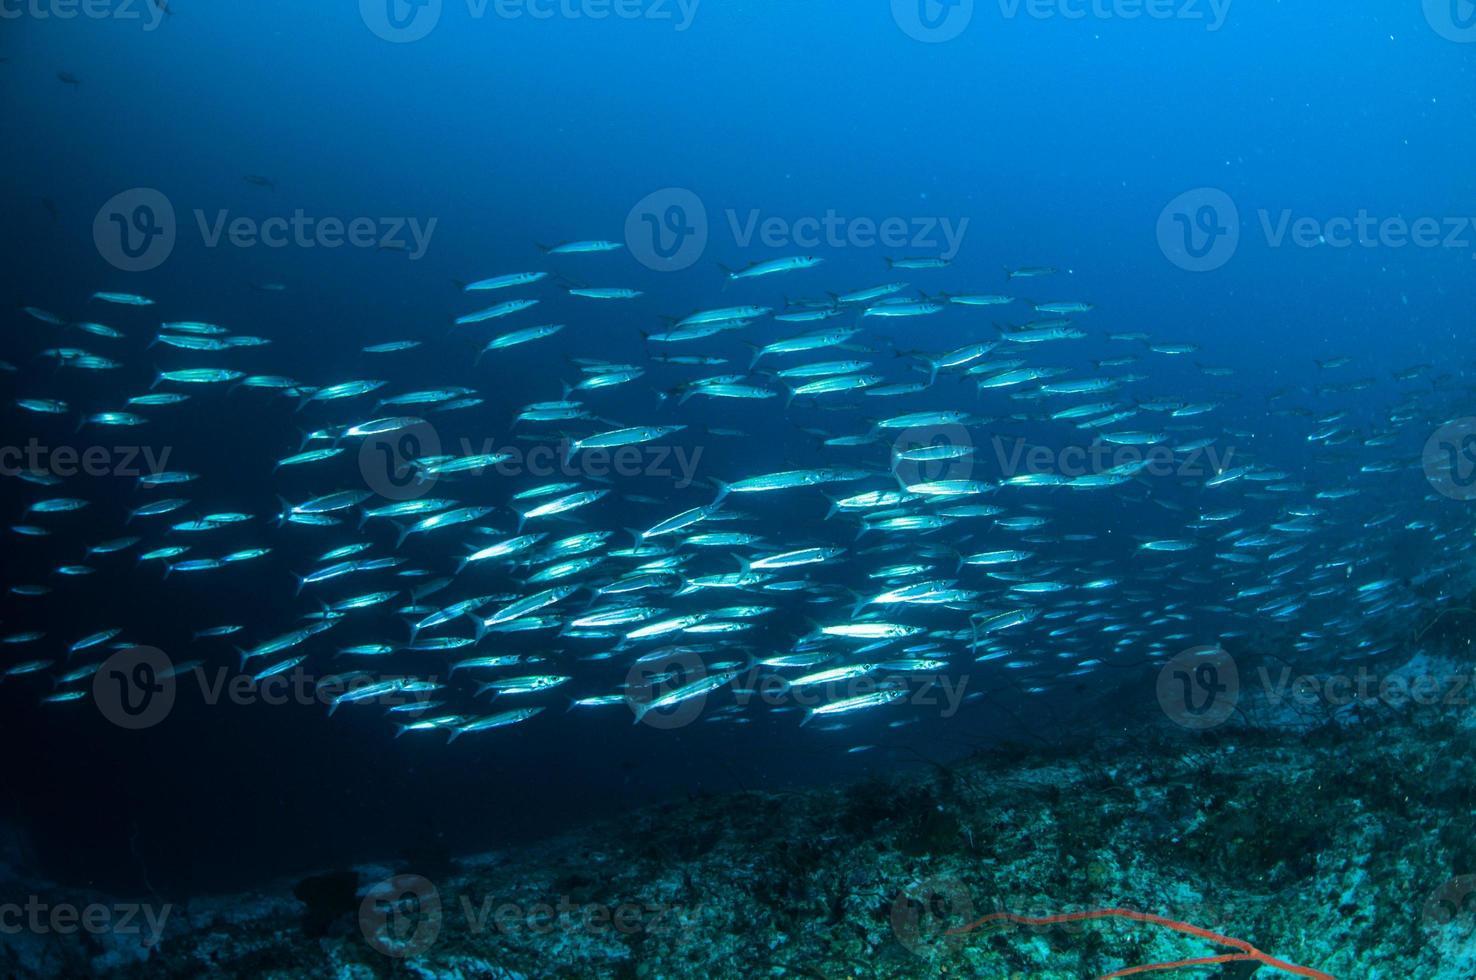 scolaro pesce barracuda kapoposang indonesia subacquea subacqueo foto